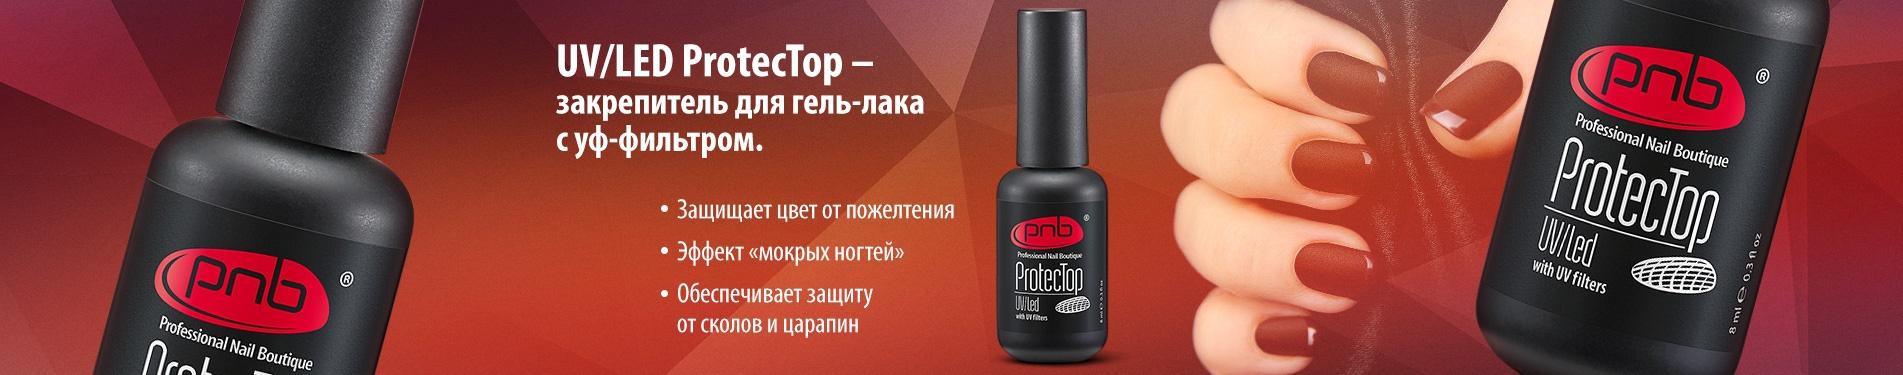 UV/LED ProtecTop